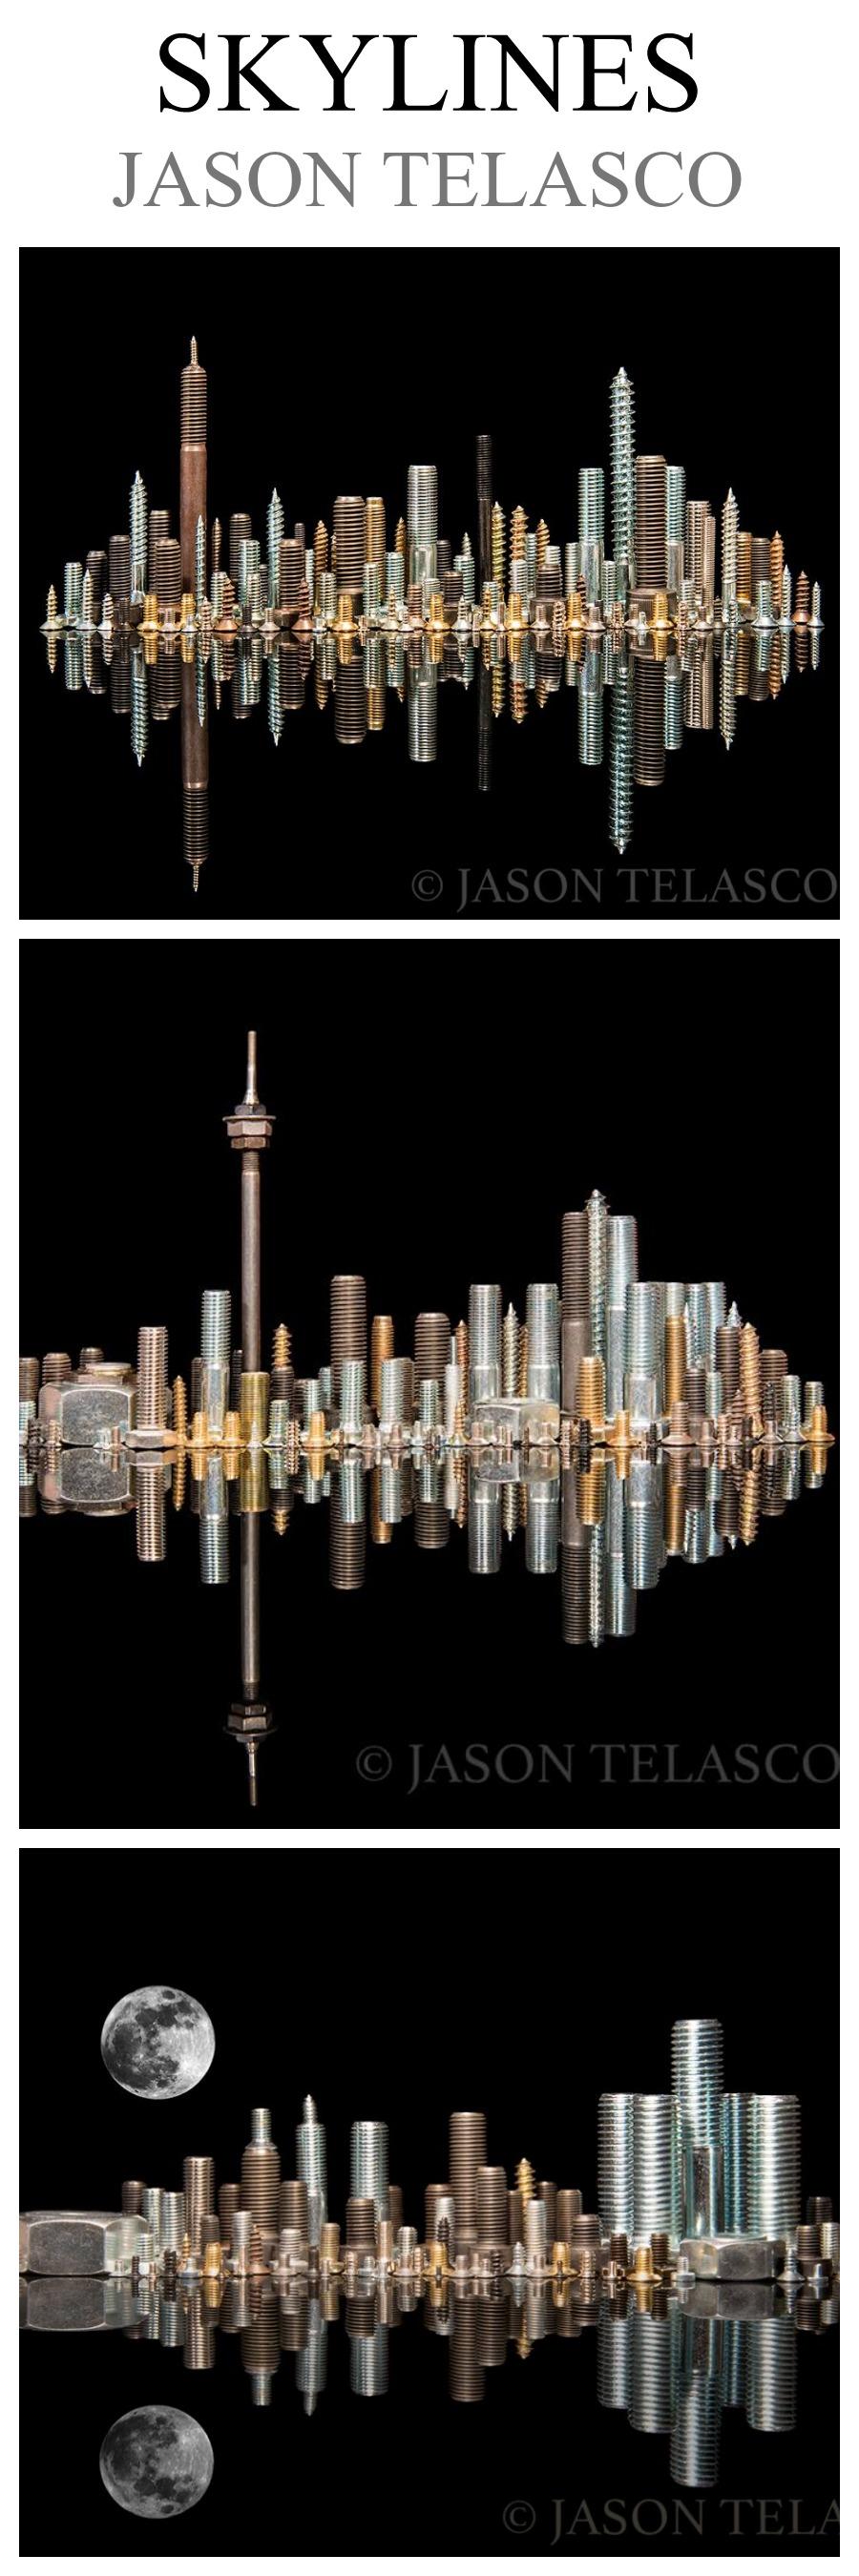 Jason Telasco Art / Photography